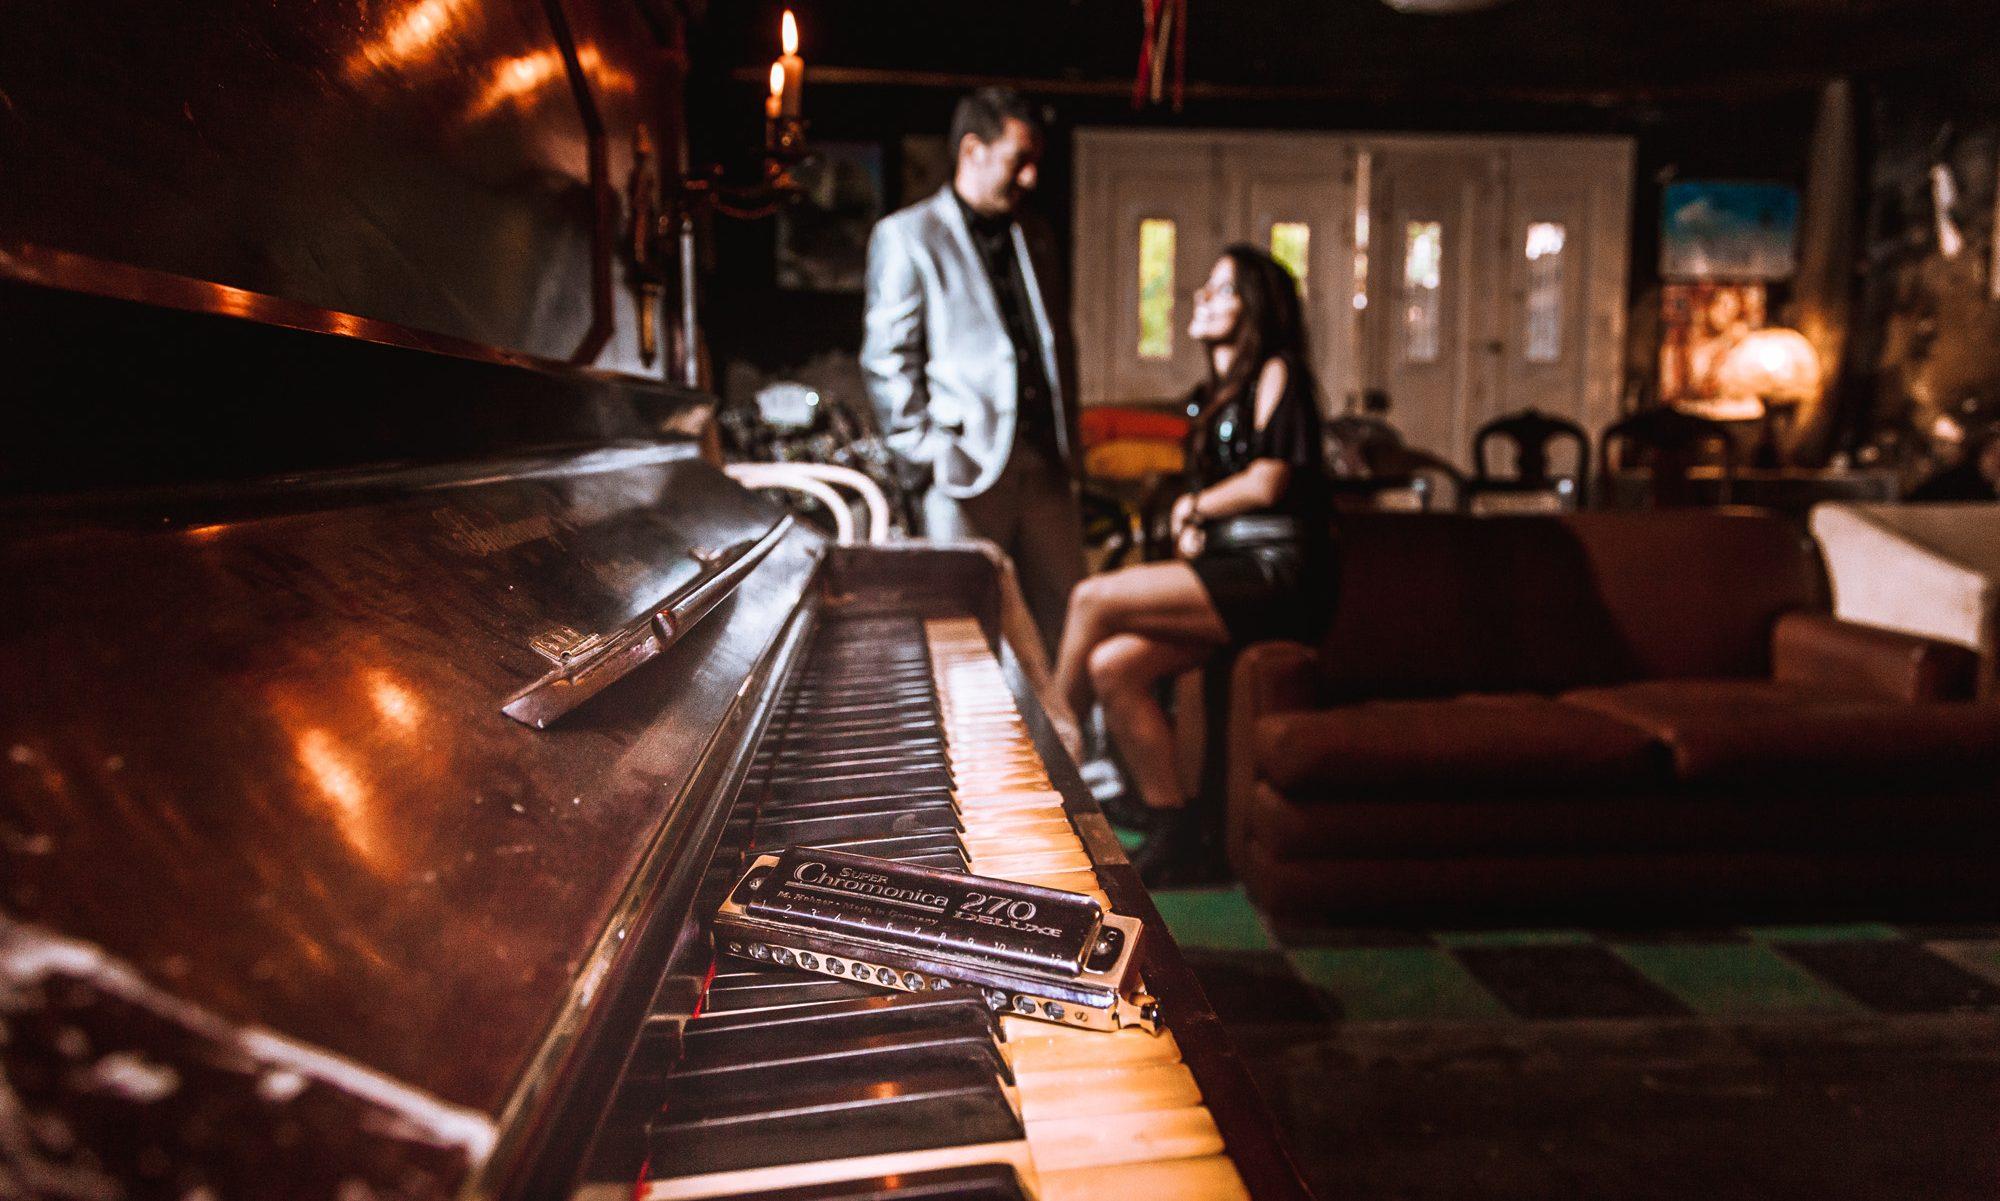 Mari Kerber & Ale Ravanello - Piano & Harmonica Duet